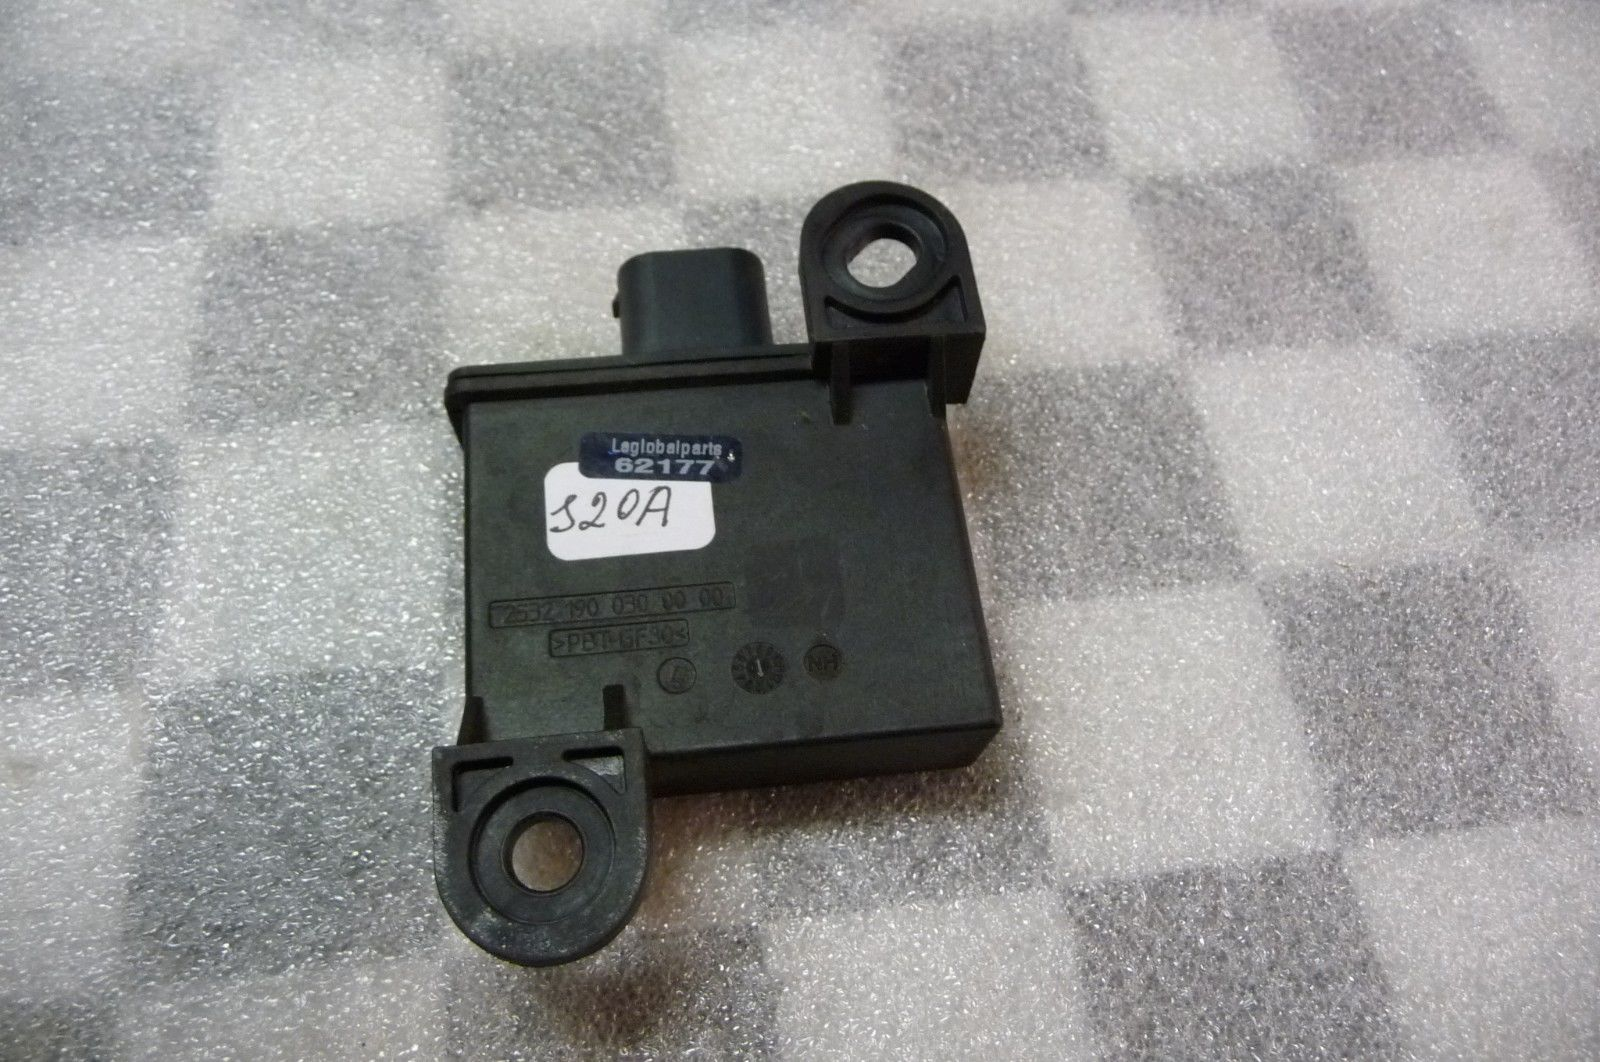 BMW 1 3 5 6 7 B7 X5 X6 Z4 Tire Pressure Control Trigger Transmitter 36236781846